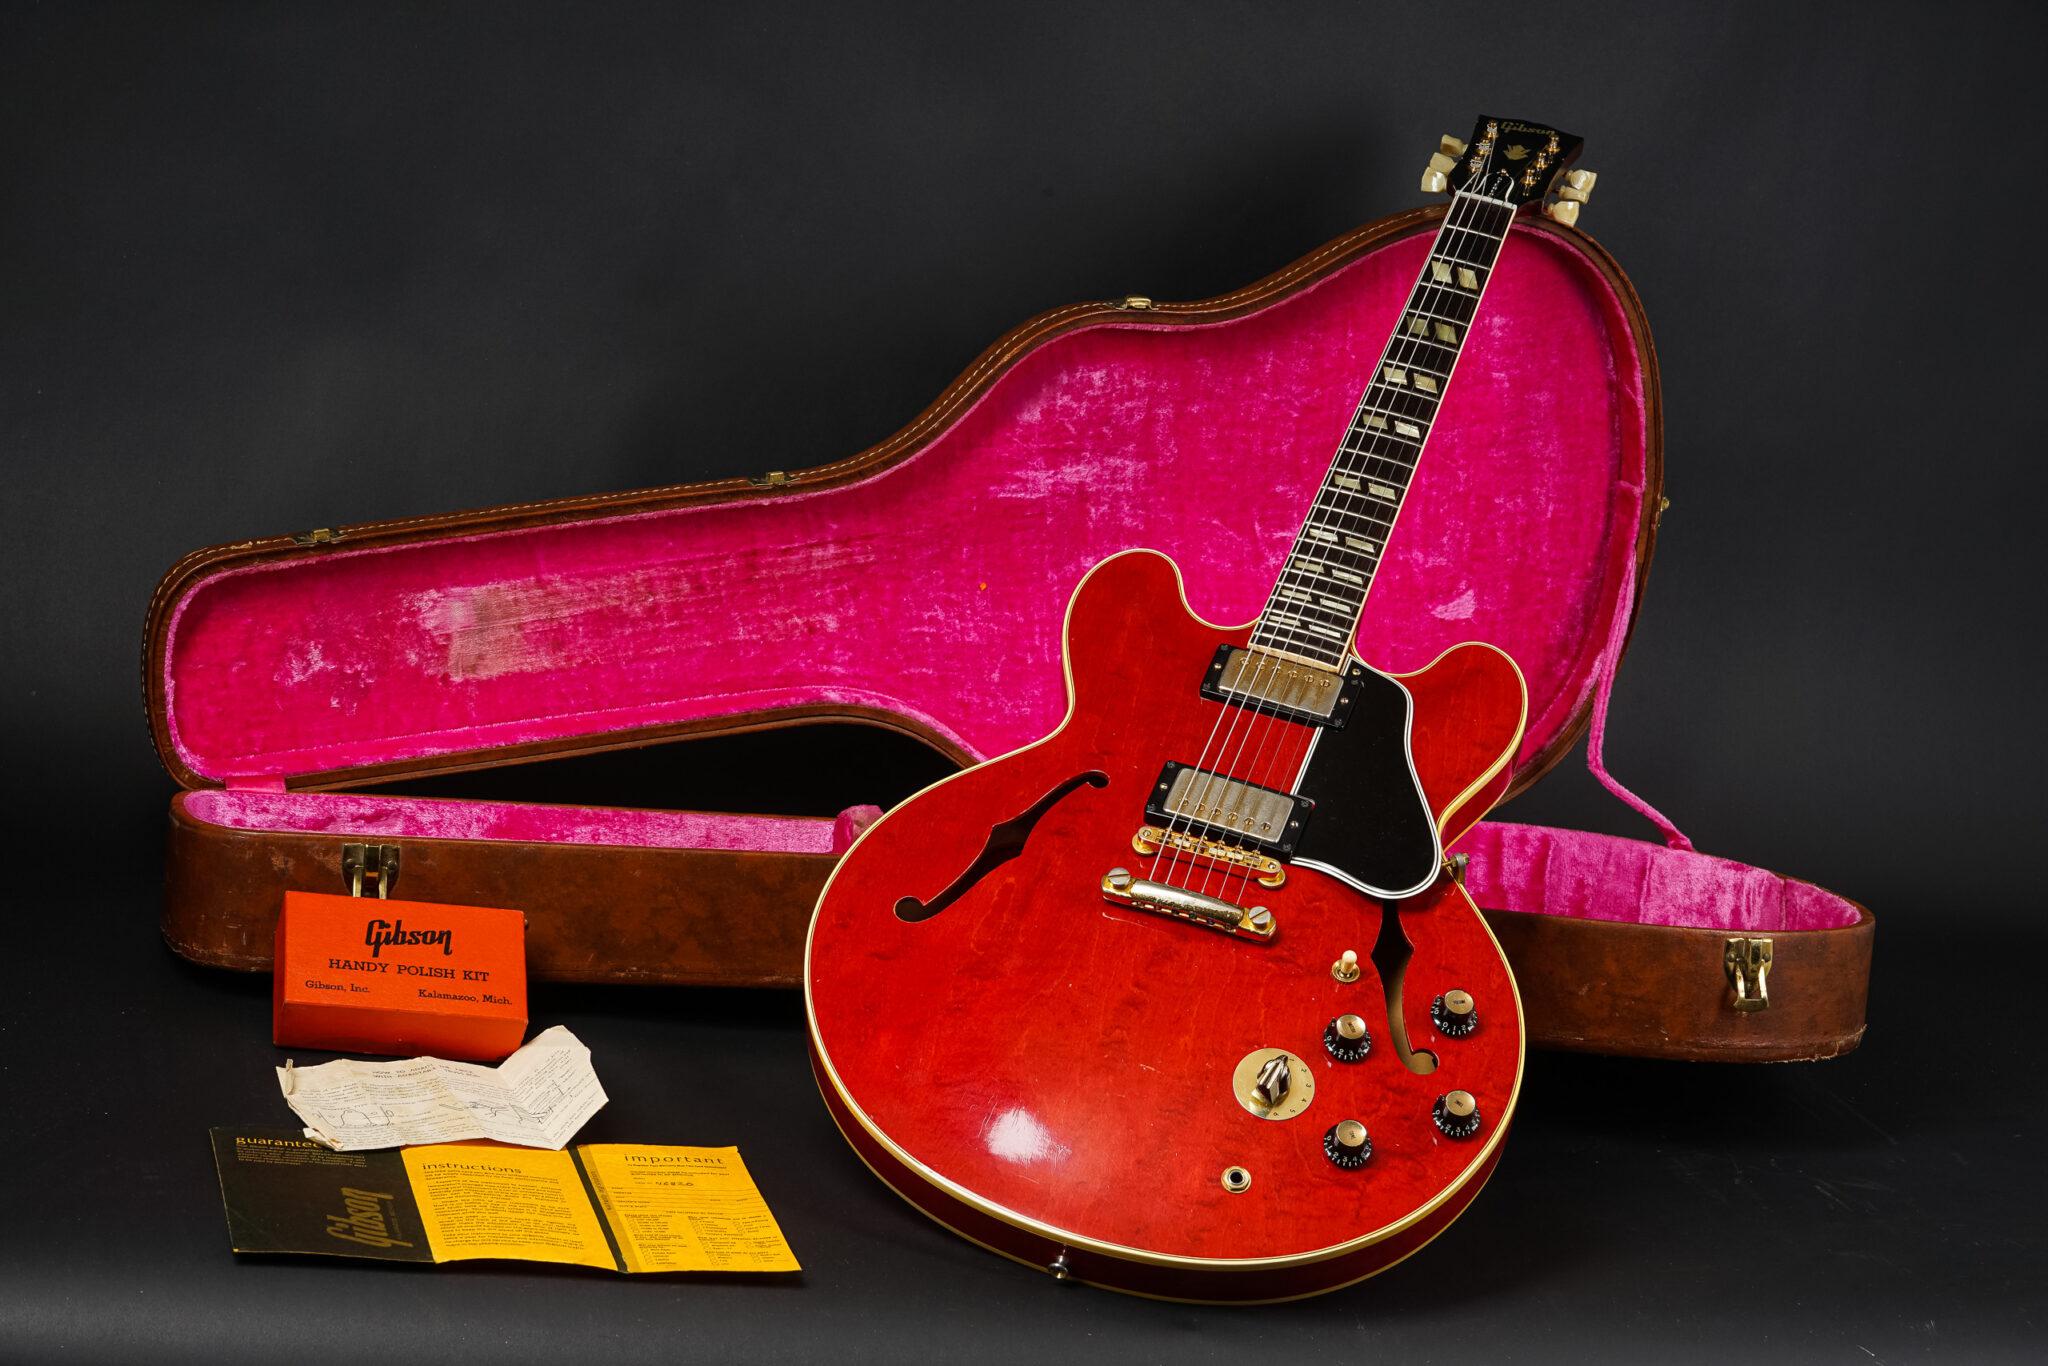 https://guitarpoint.de/app/uploads/products/1962-gibson-es-345tdc-stereo-cherry-exc/1962-Gibson-ES-345TD-46820-12-2048x1366.jpg